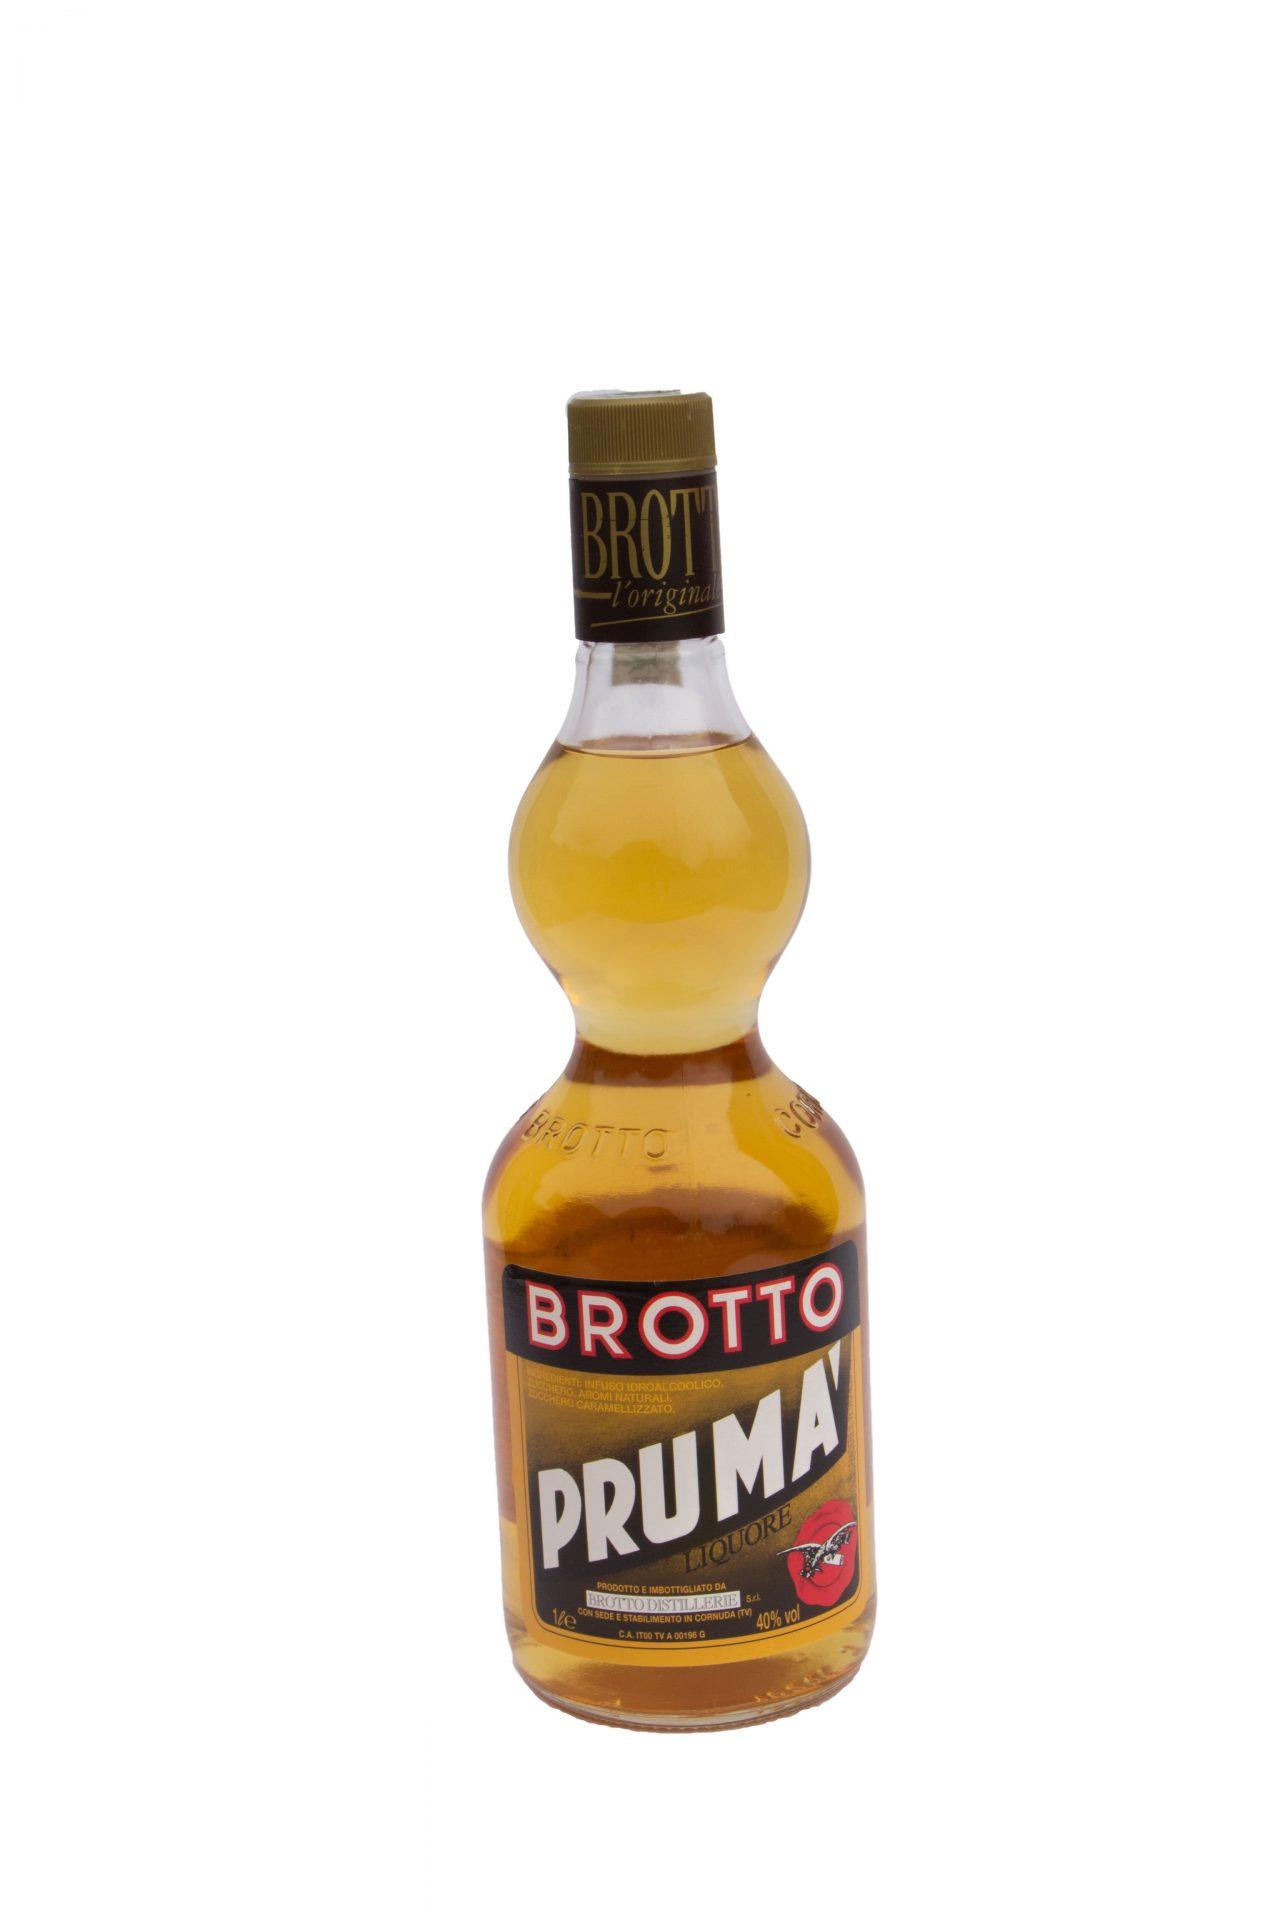 Brotto – Prumà